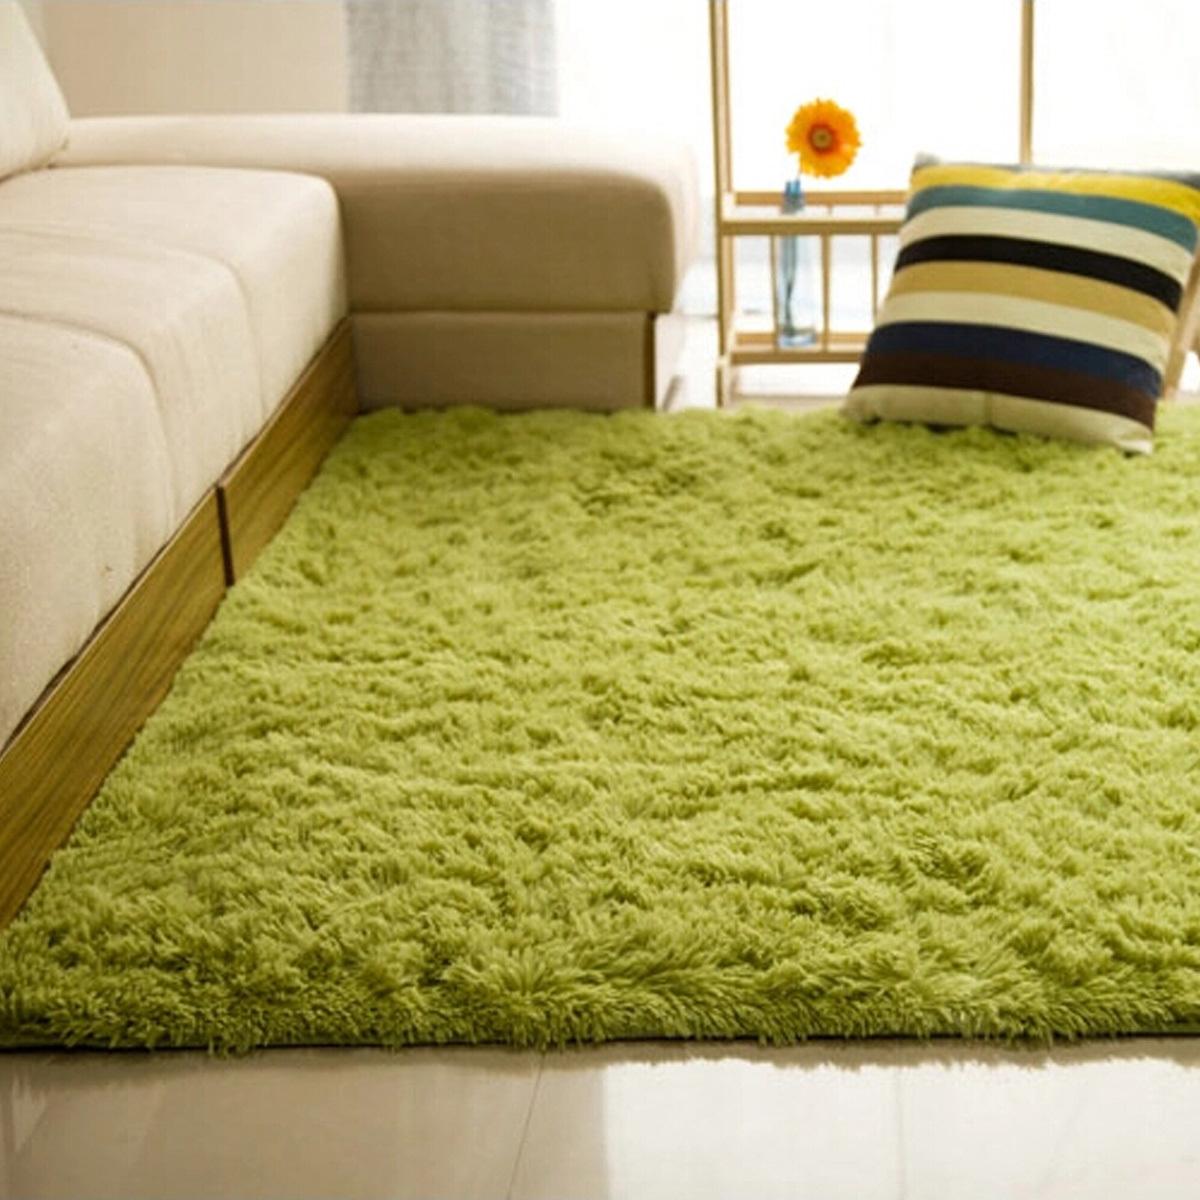 Fluffy Rugs Floor Yoga Bedroom Mat Source · 80120cm Green Source Blue Lazada .